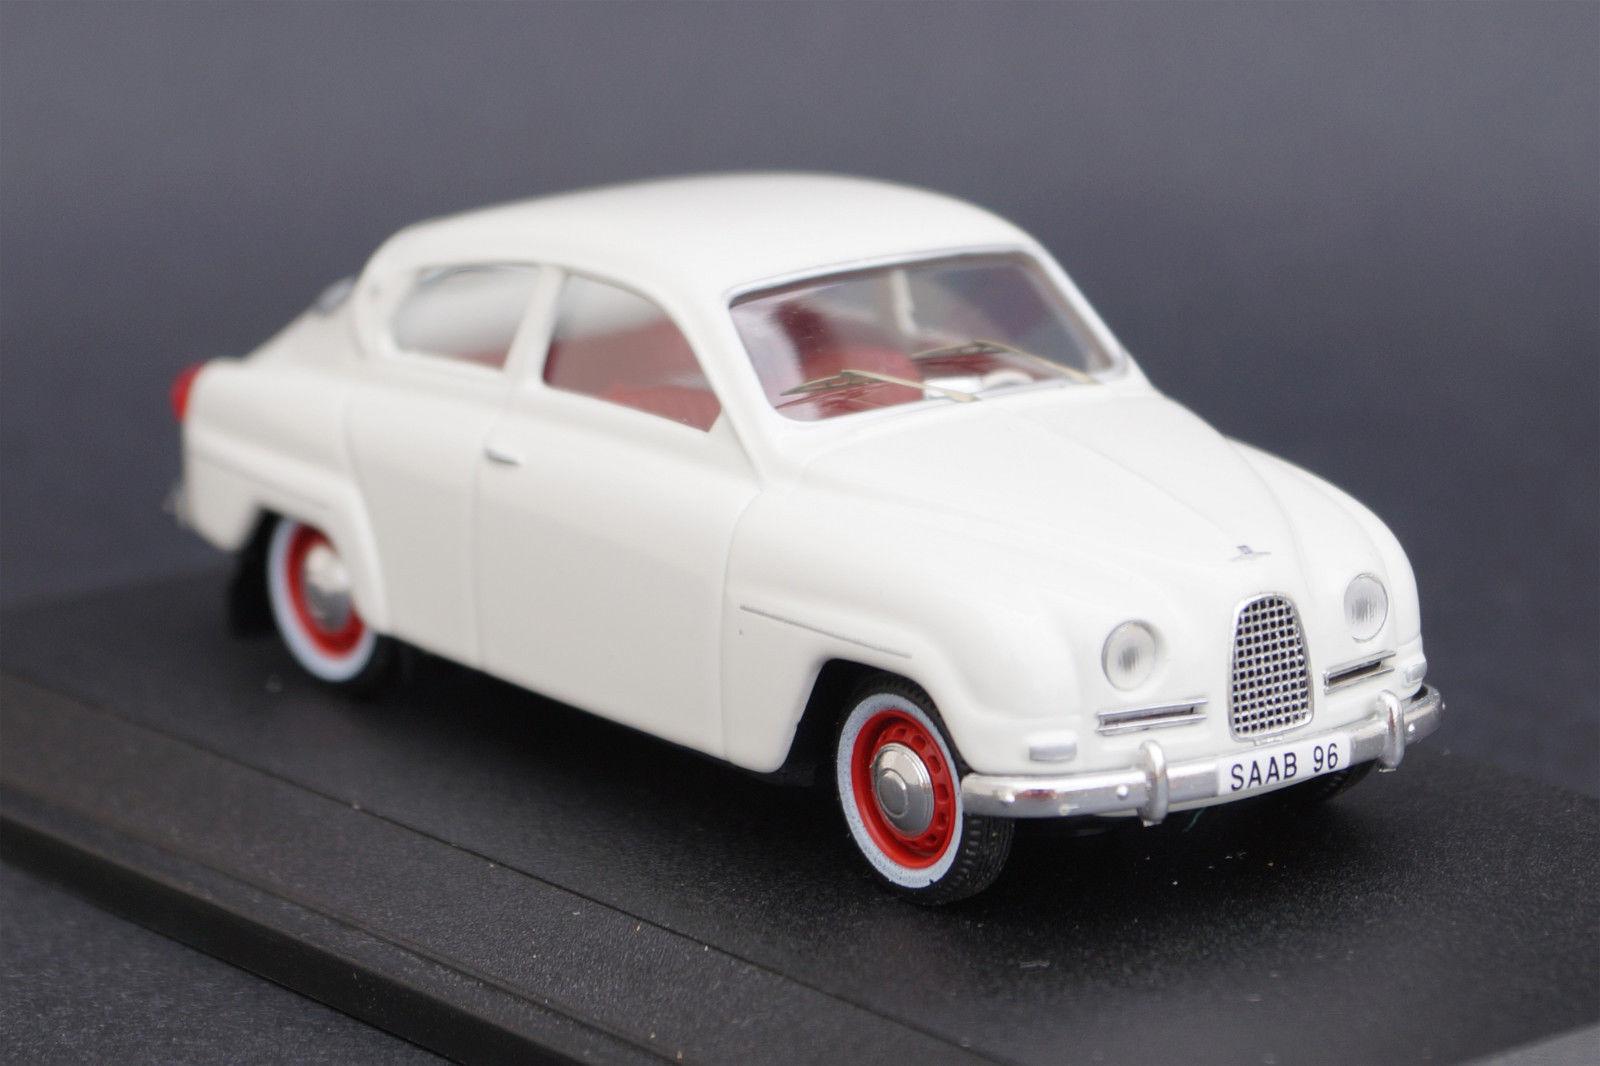 1 43 1960 Saab 96 model Replicar made in Portugal White